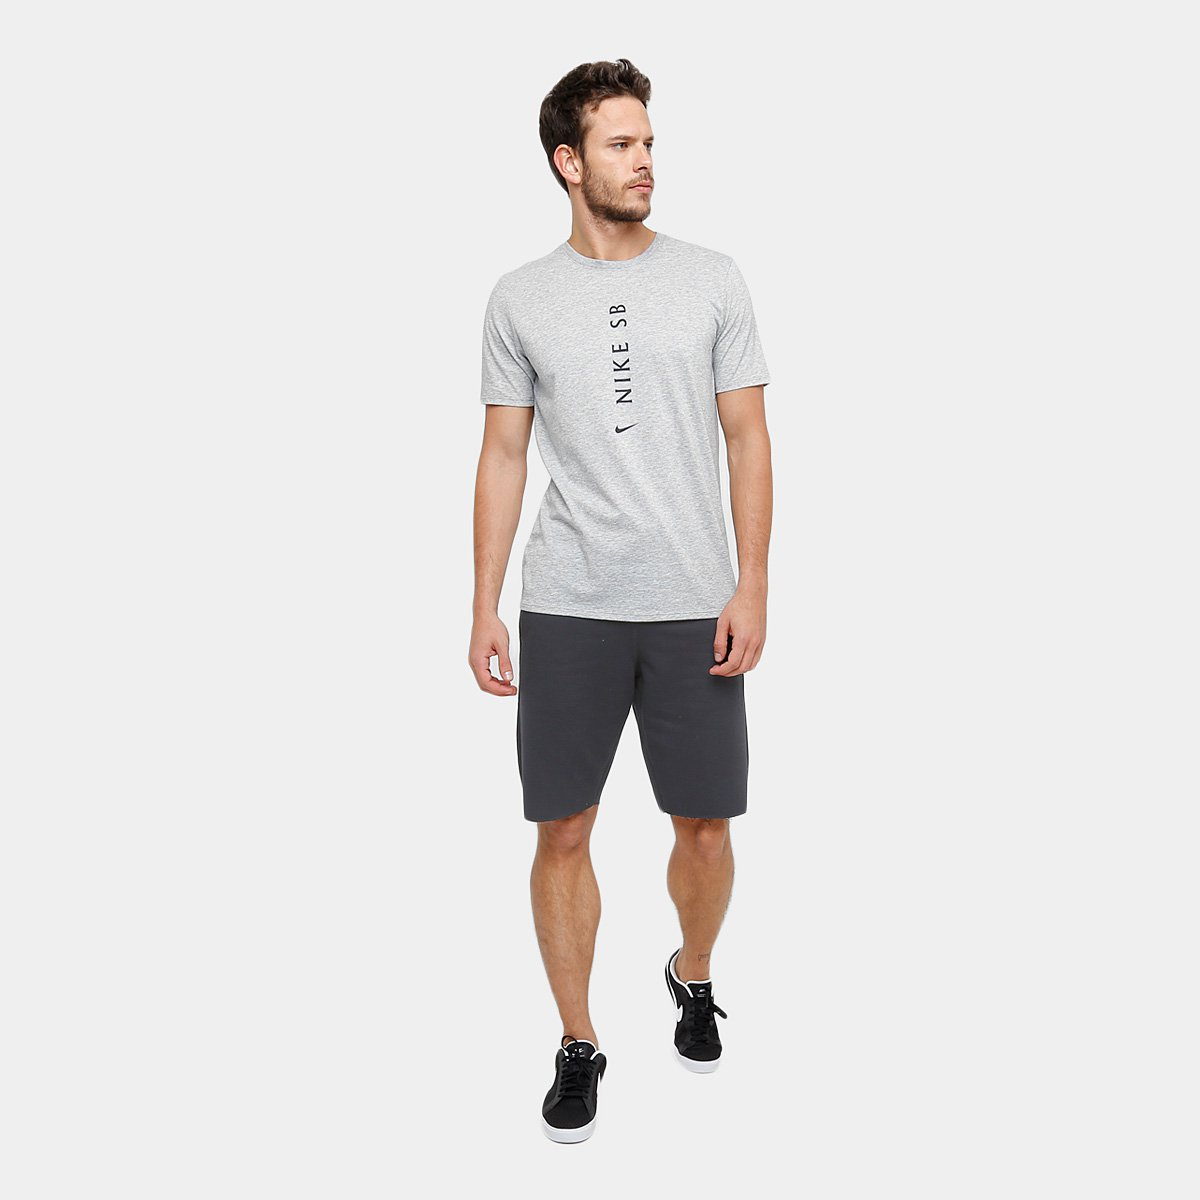 ce01d4d25c221 Camiseta Nike SB Dry Tee Dfc Brand Masculina - Compre Agora